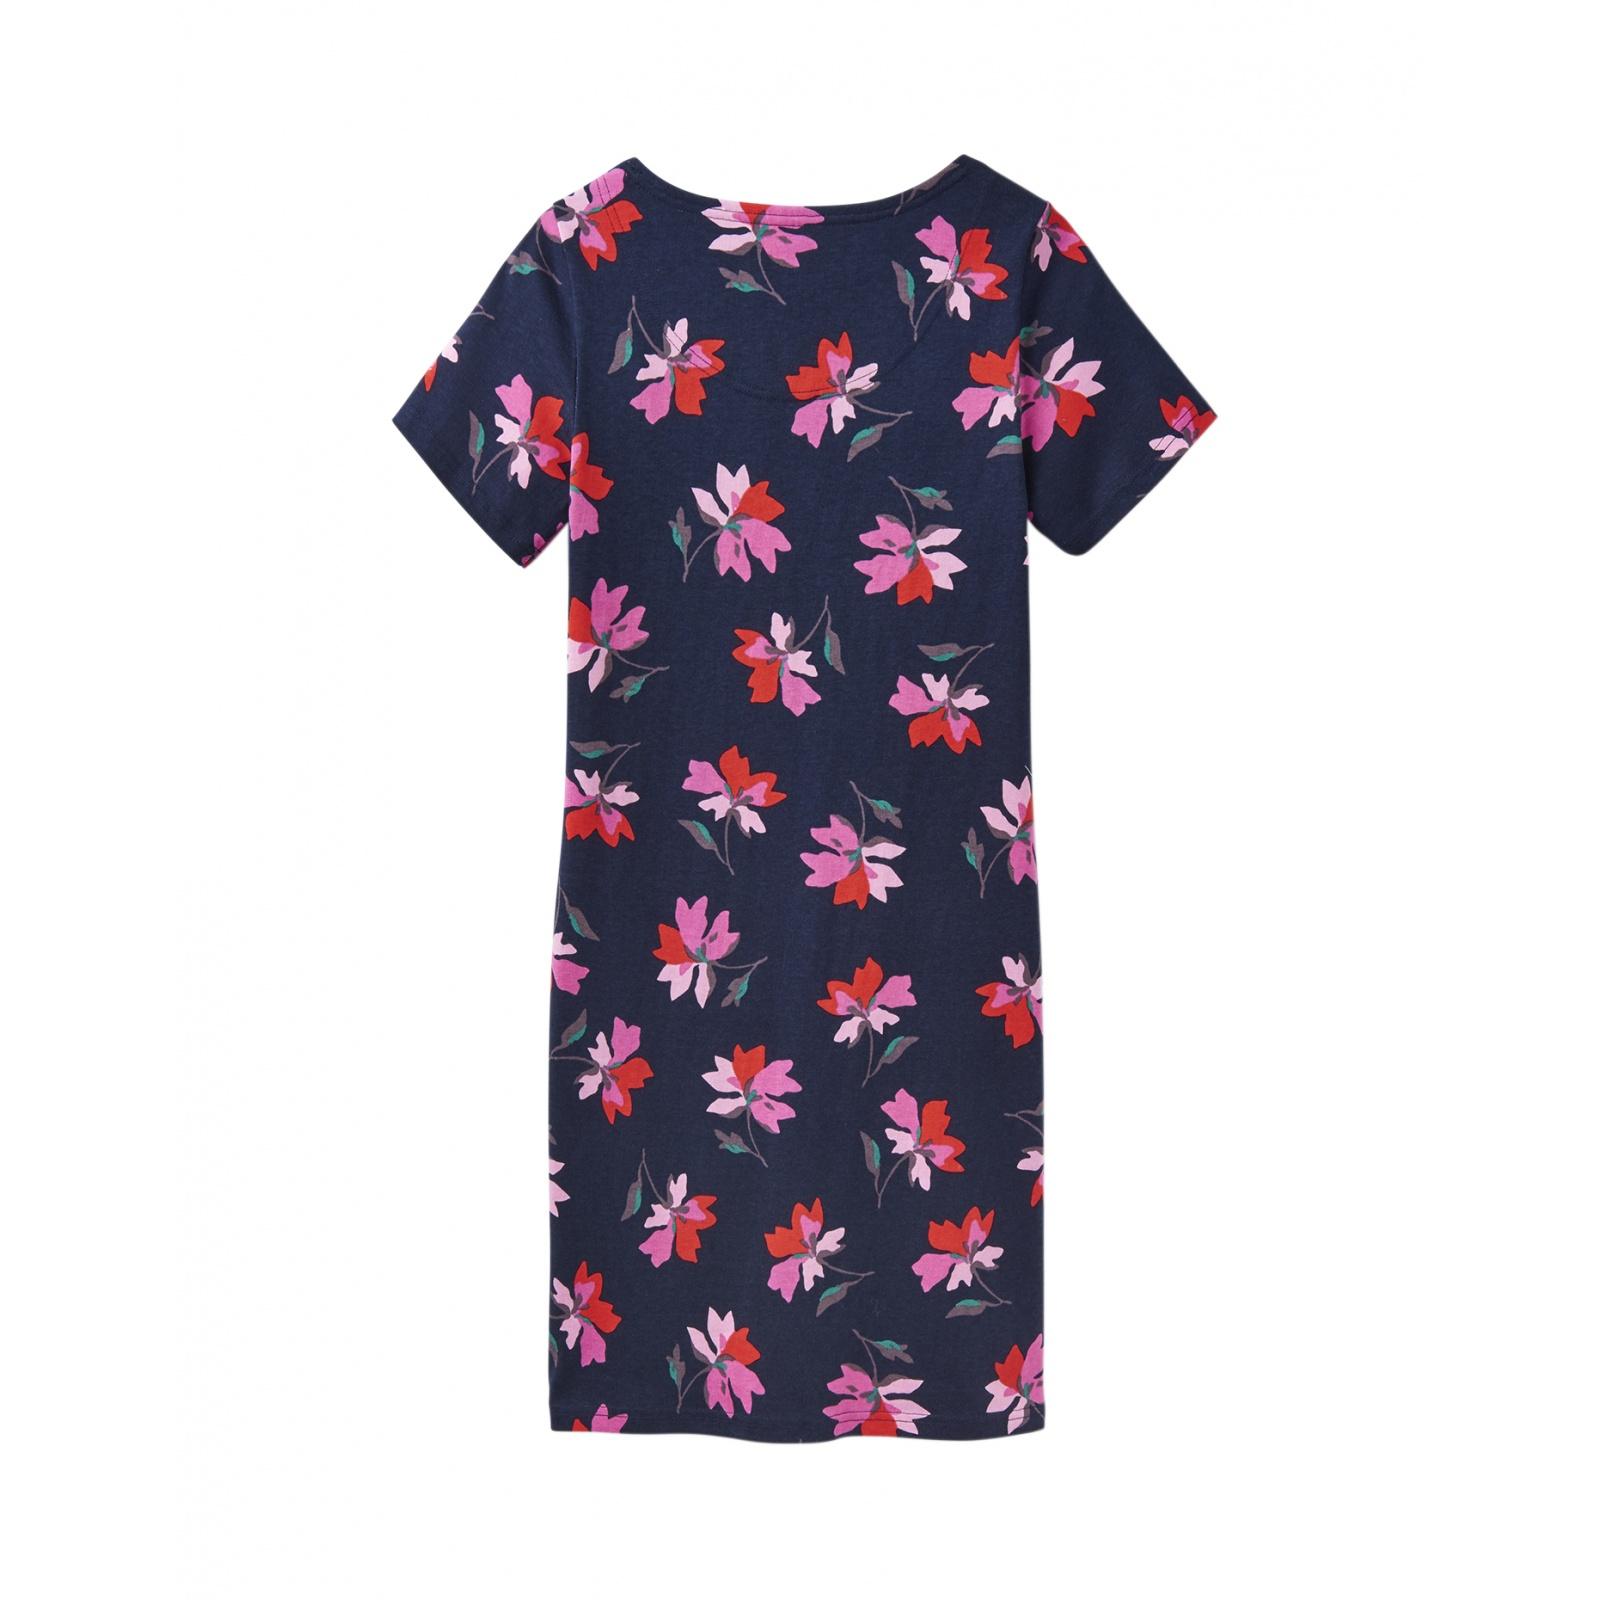 Joules-Riviera-Print-T-Shirt-Dress-with-Short-Sleeves-SS19 thumbnail 21